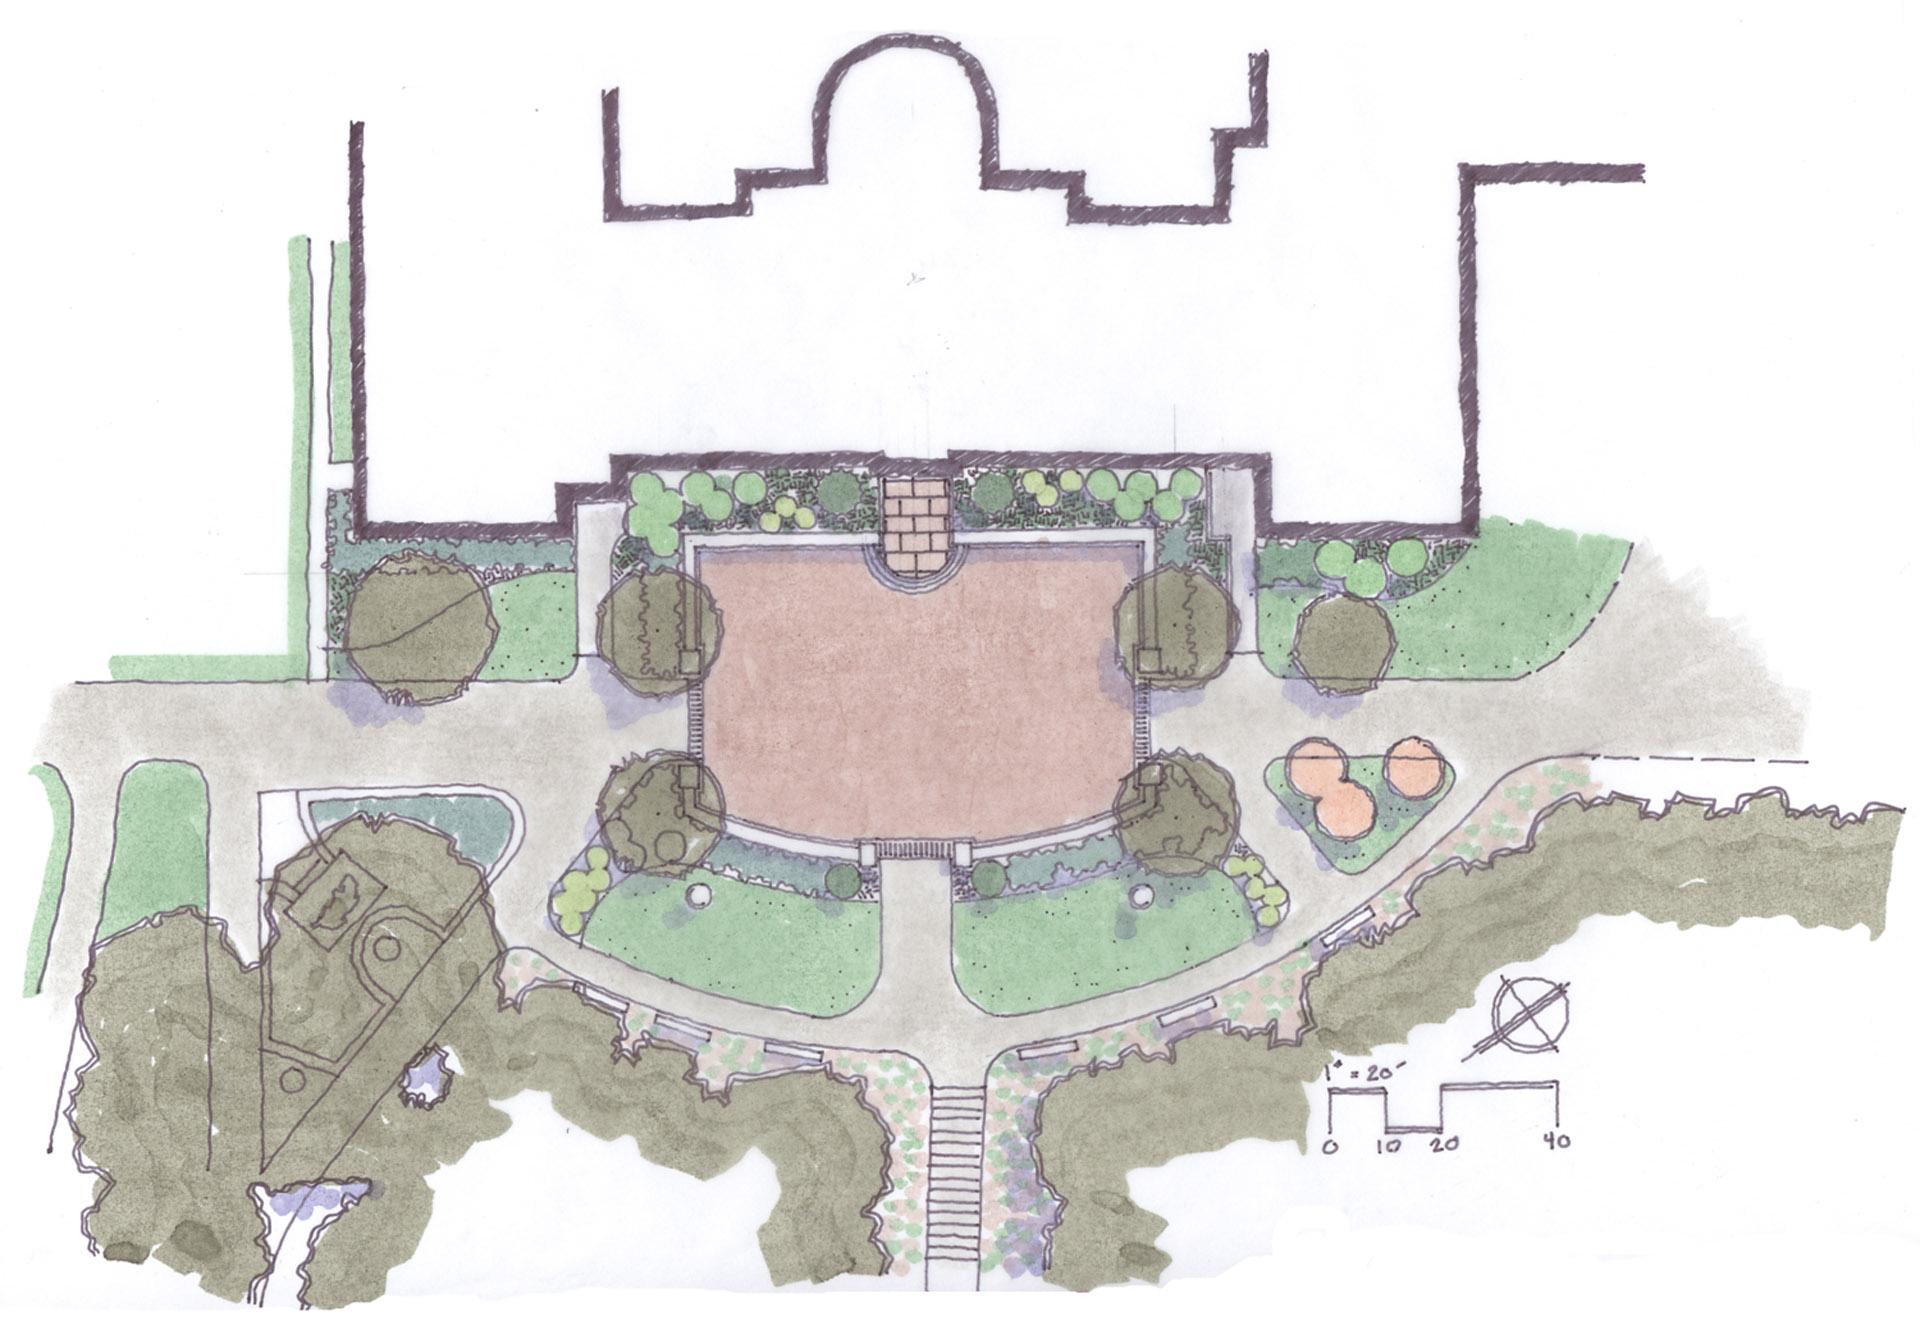 Penn State University Abington Campus Option A Plan